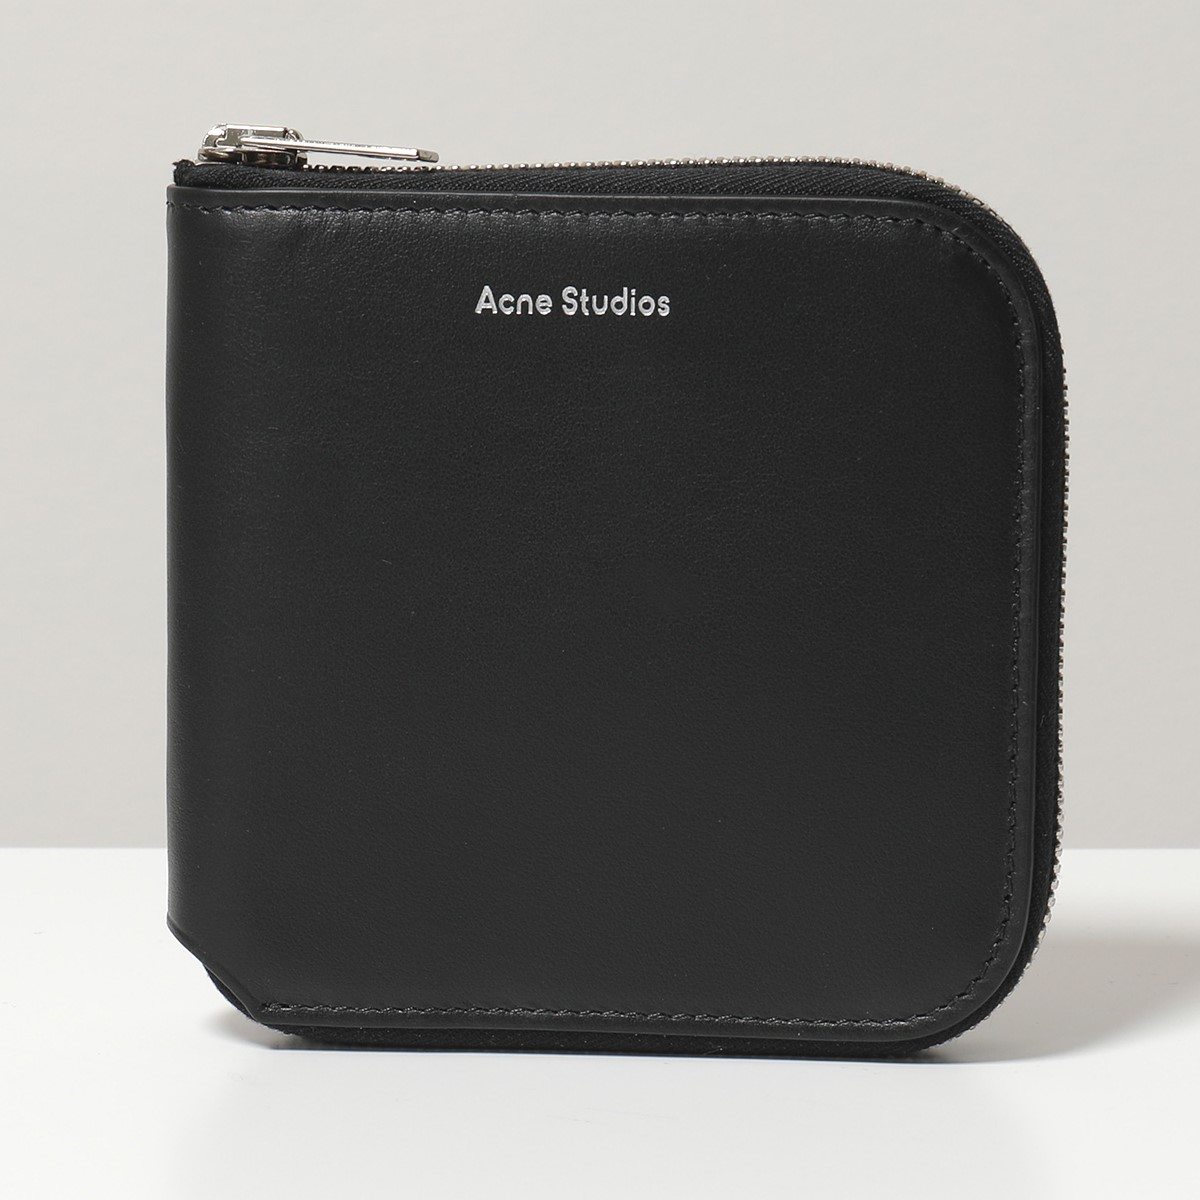 Acne Studios アクネ ストゥディオズ 1TD174 900000 CSARITE S レザー 二つ折り財布 ミディアム スモール財布 Black ユニセックス